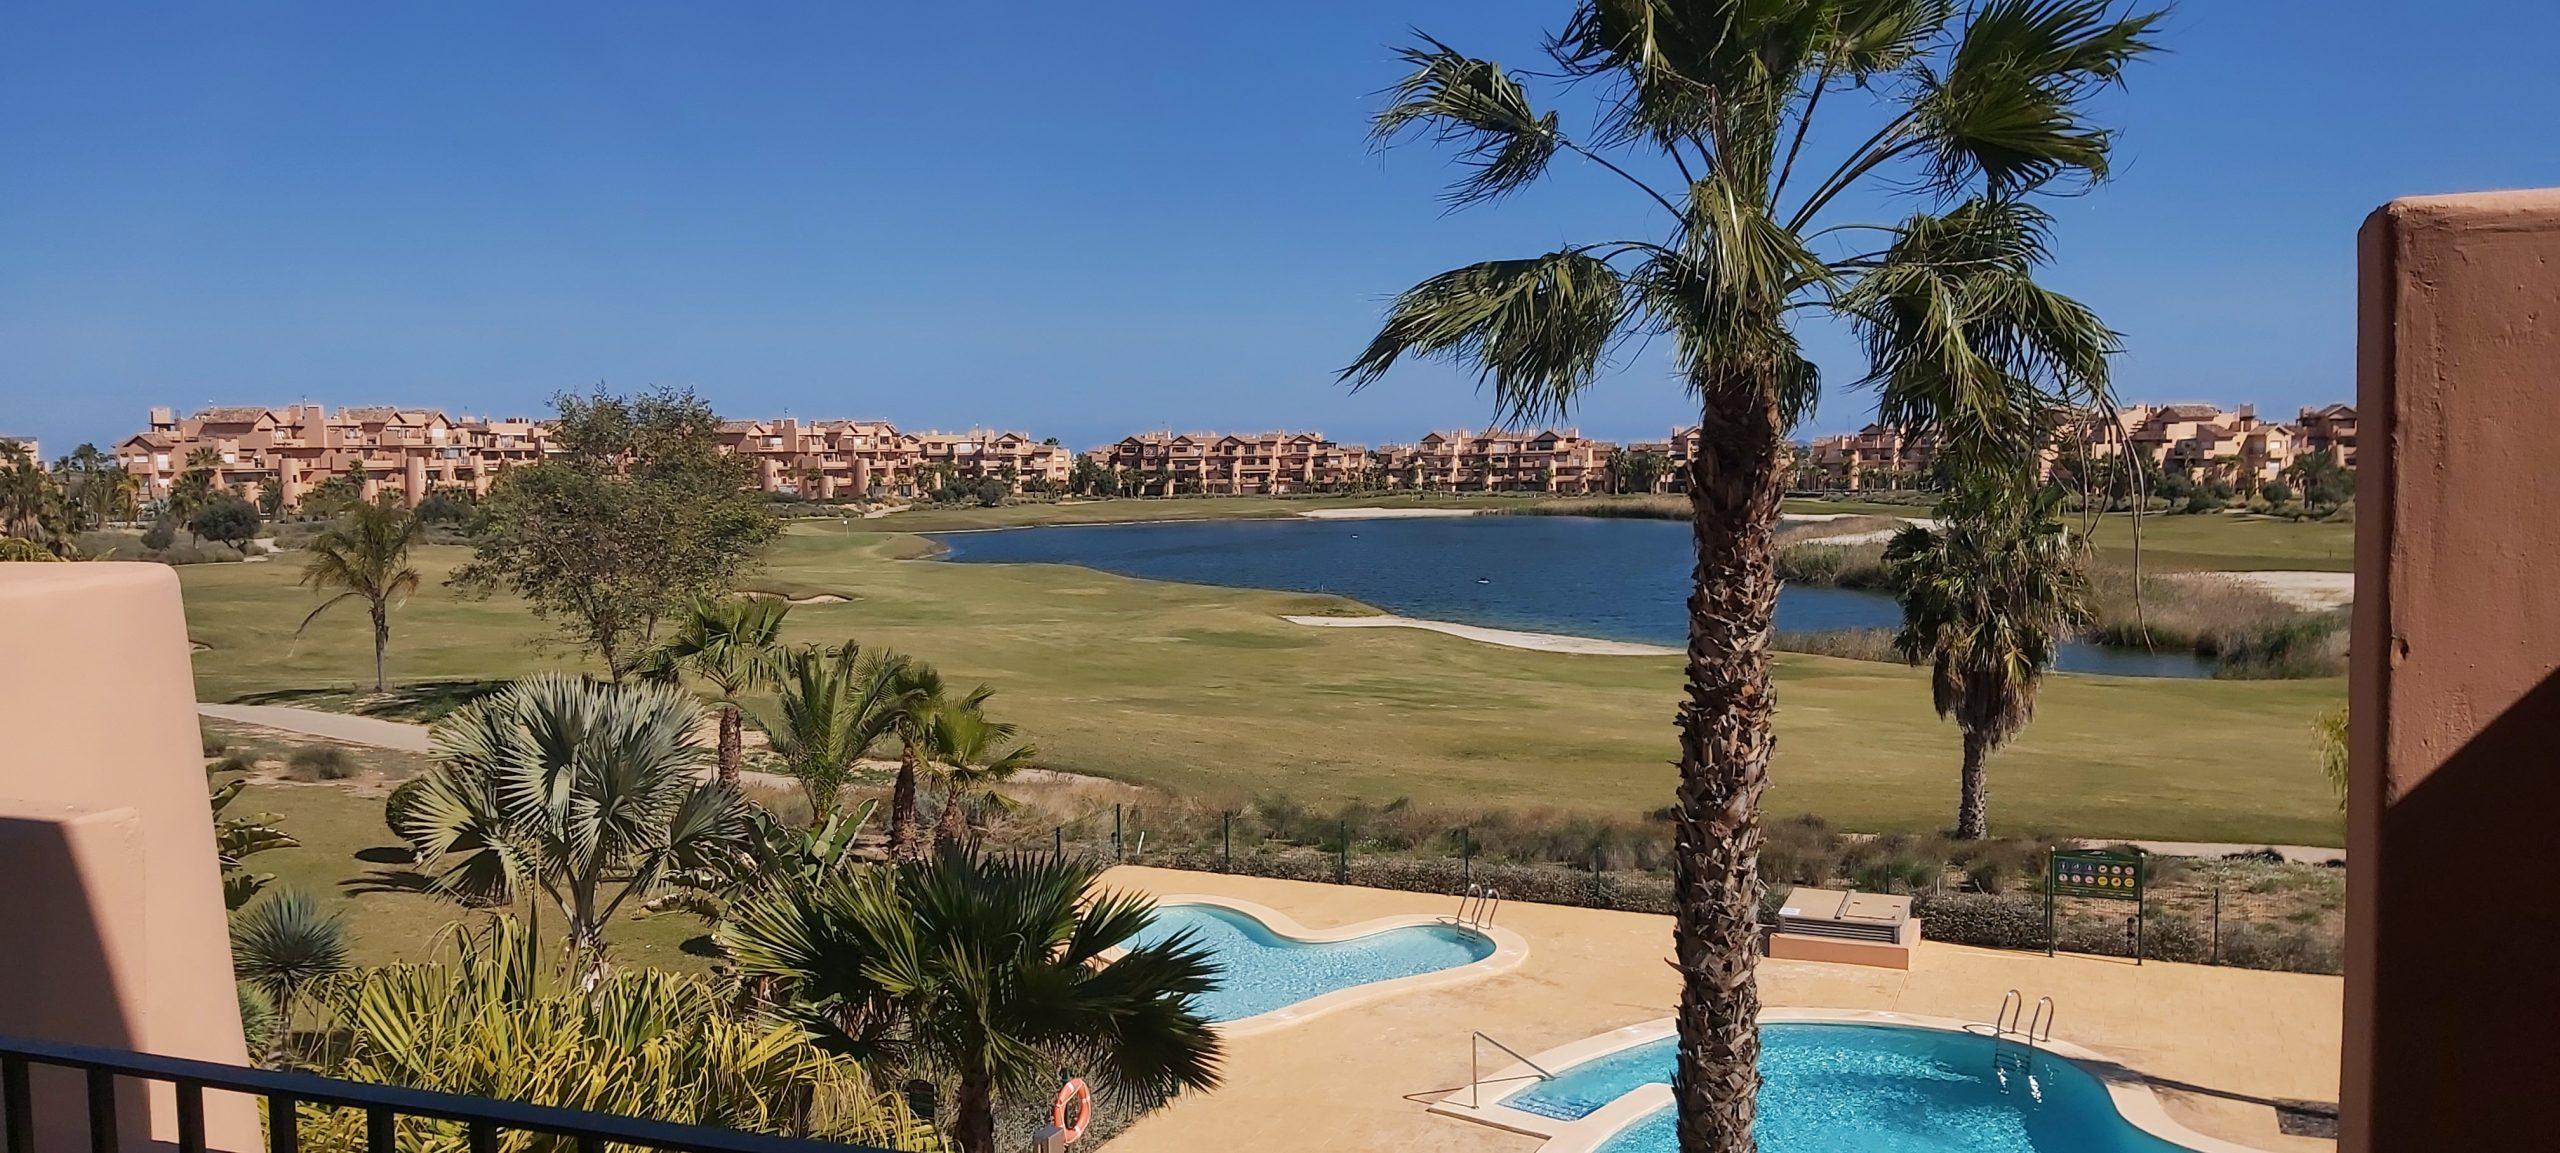 Bargain frontline golf 2 bedroom apartment on Mar Menor Golf Resort, Murcia